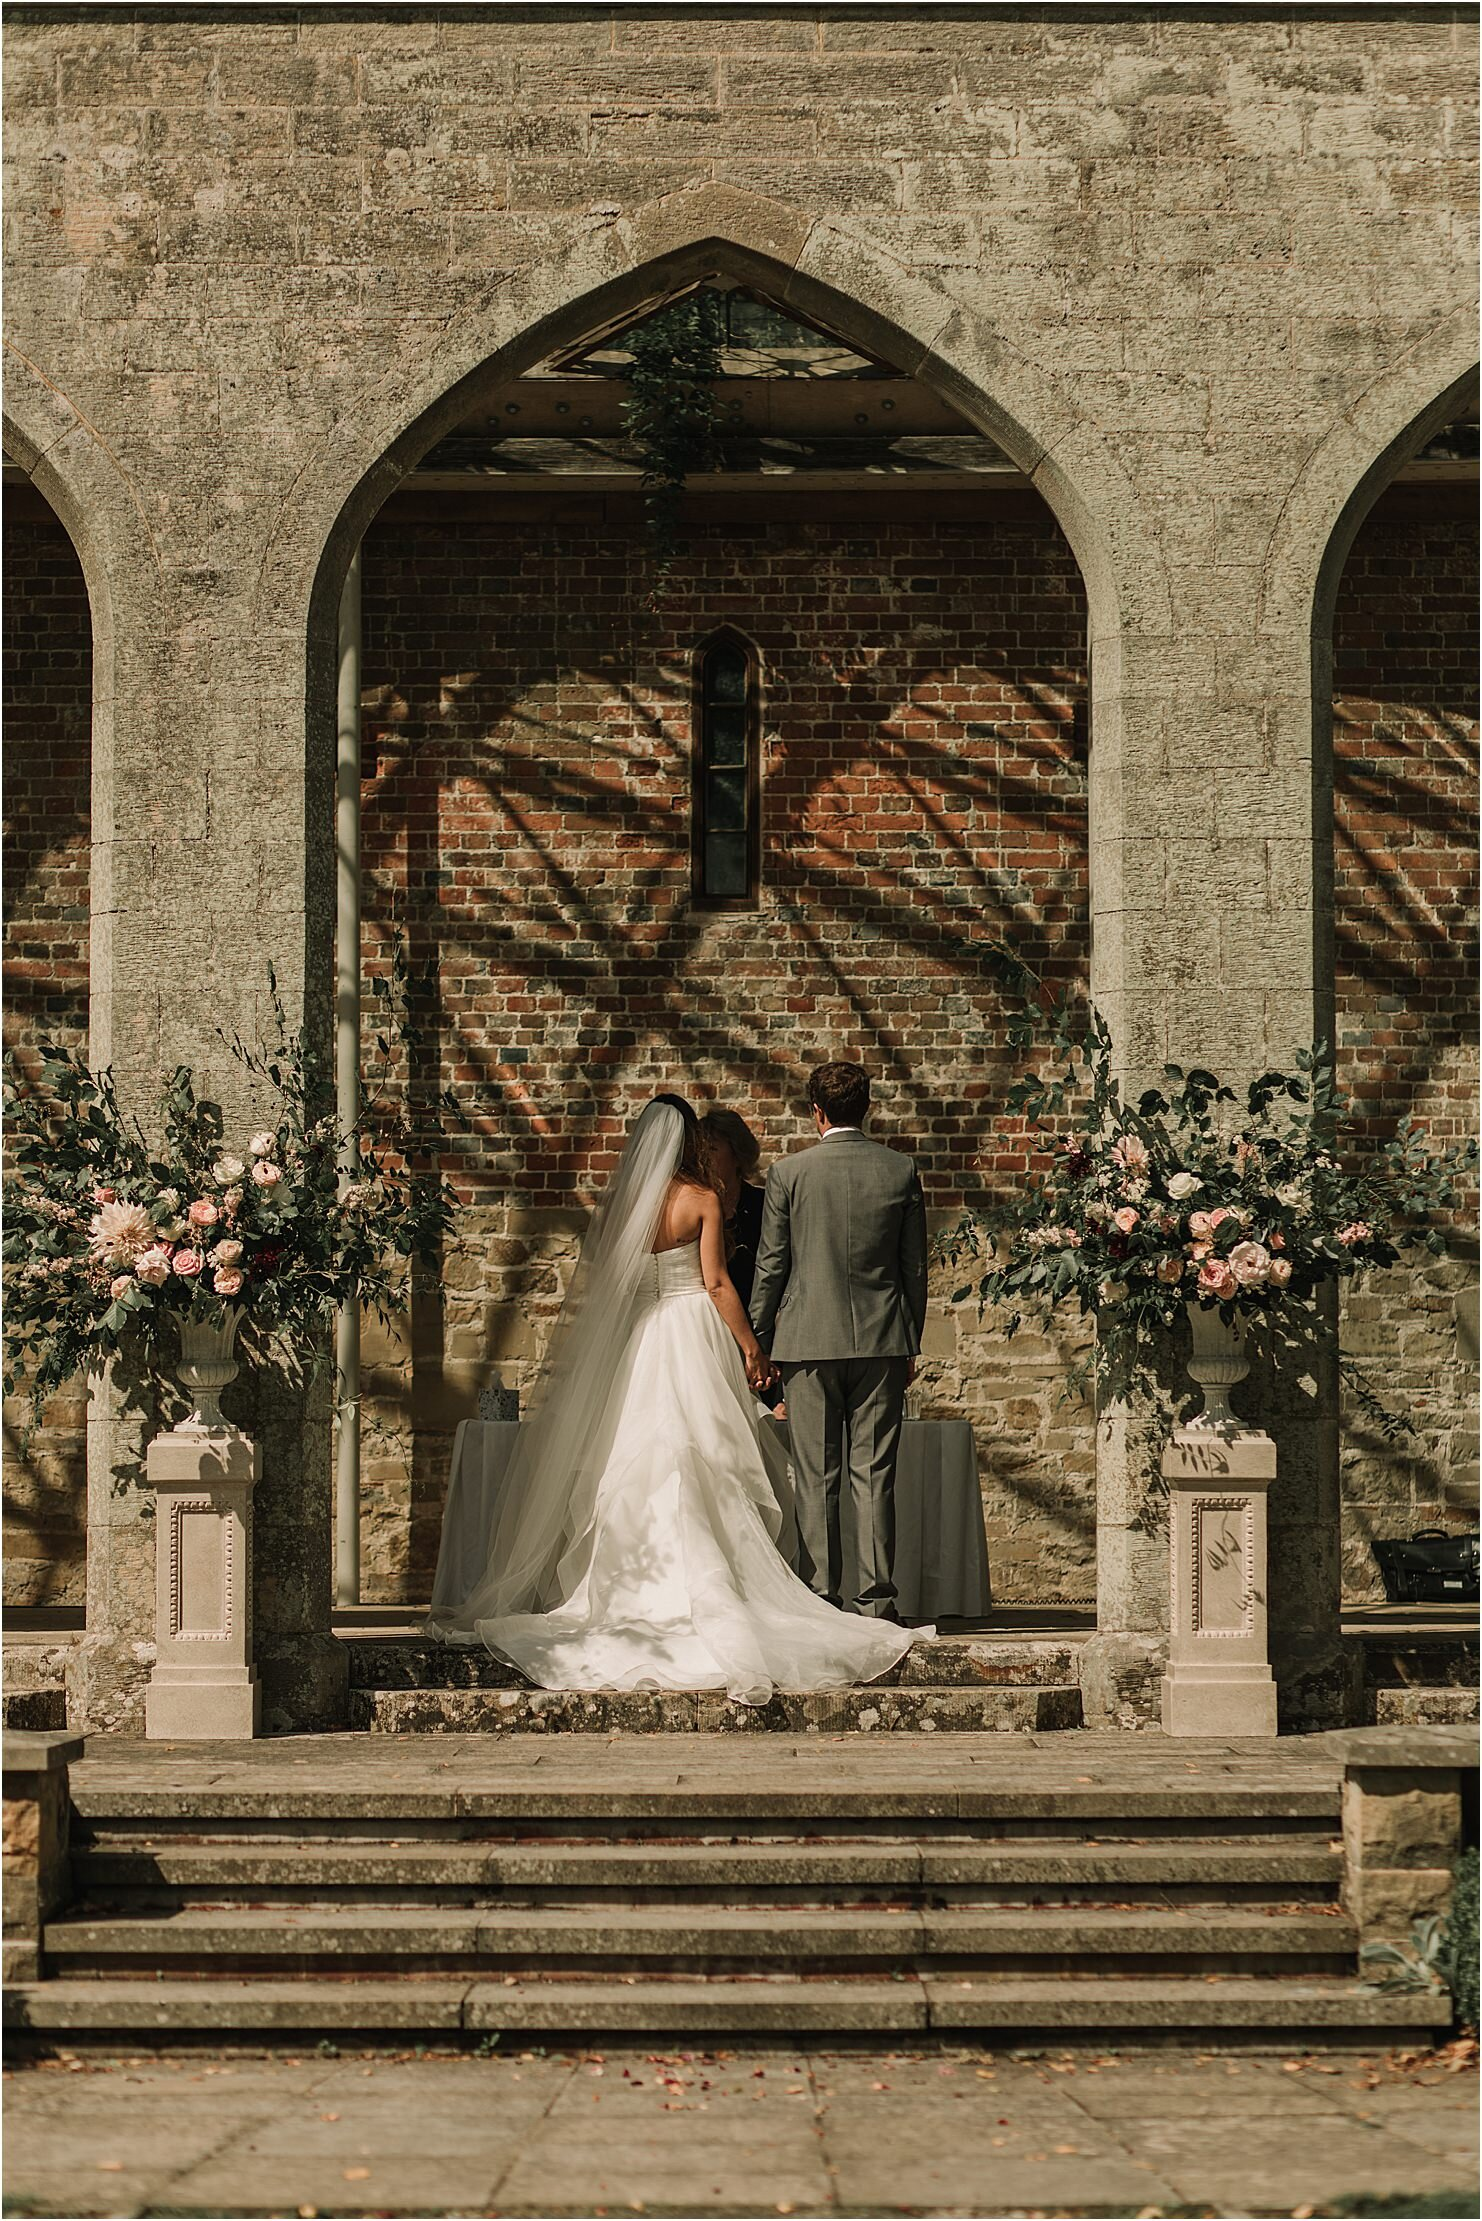 boda-de-cuento-en-castillo-boda-en-londres-52.jpg